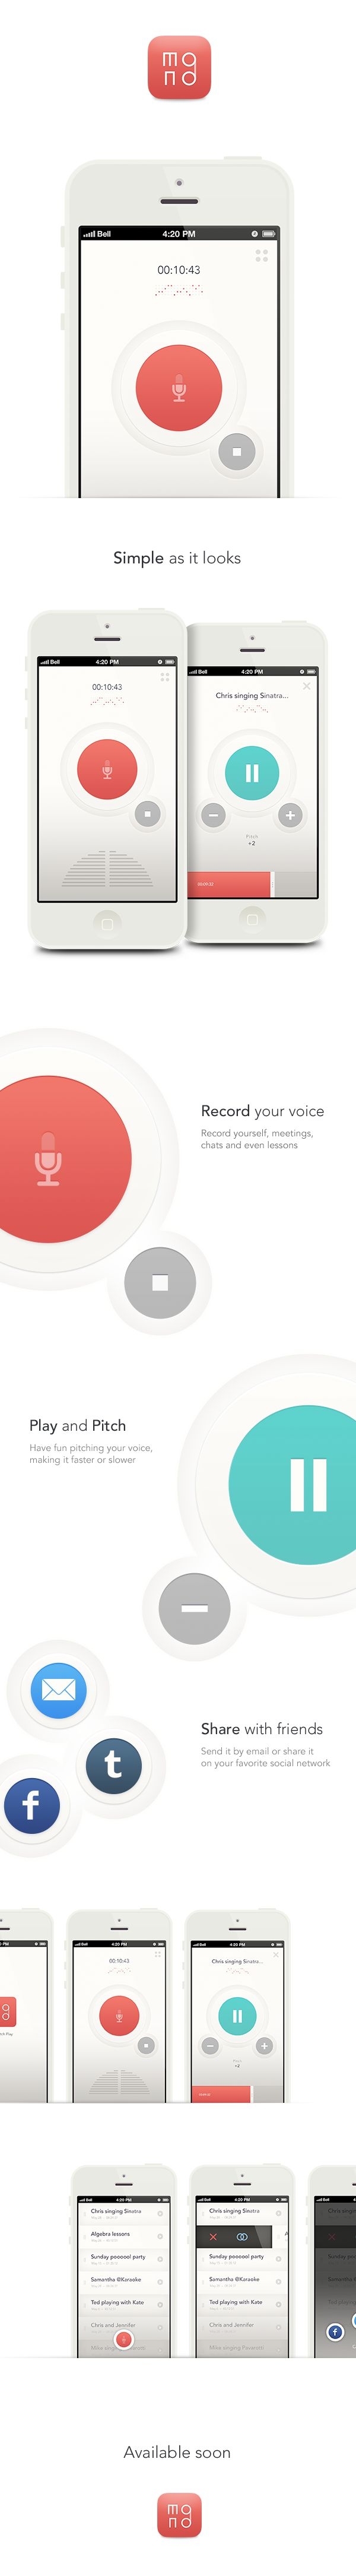 MONO iPhone app by Franco Roncoroni, via Behance